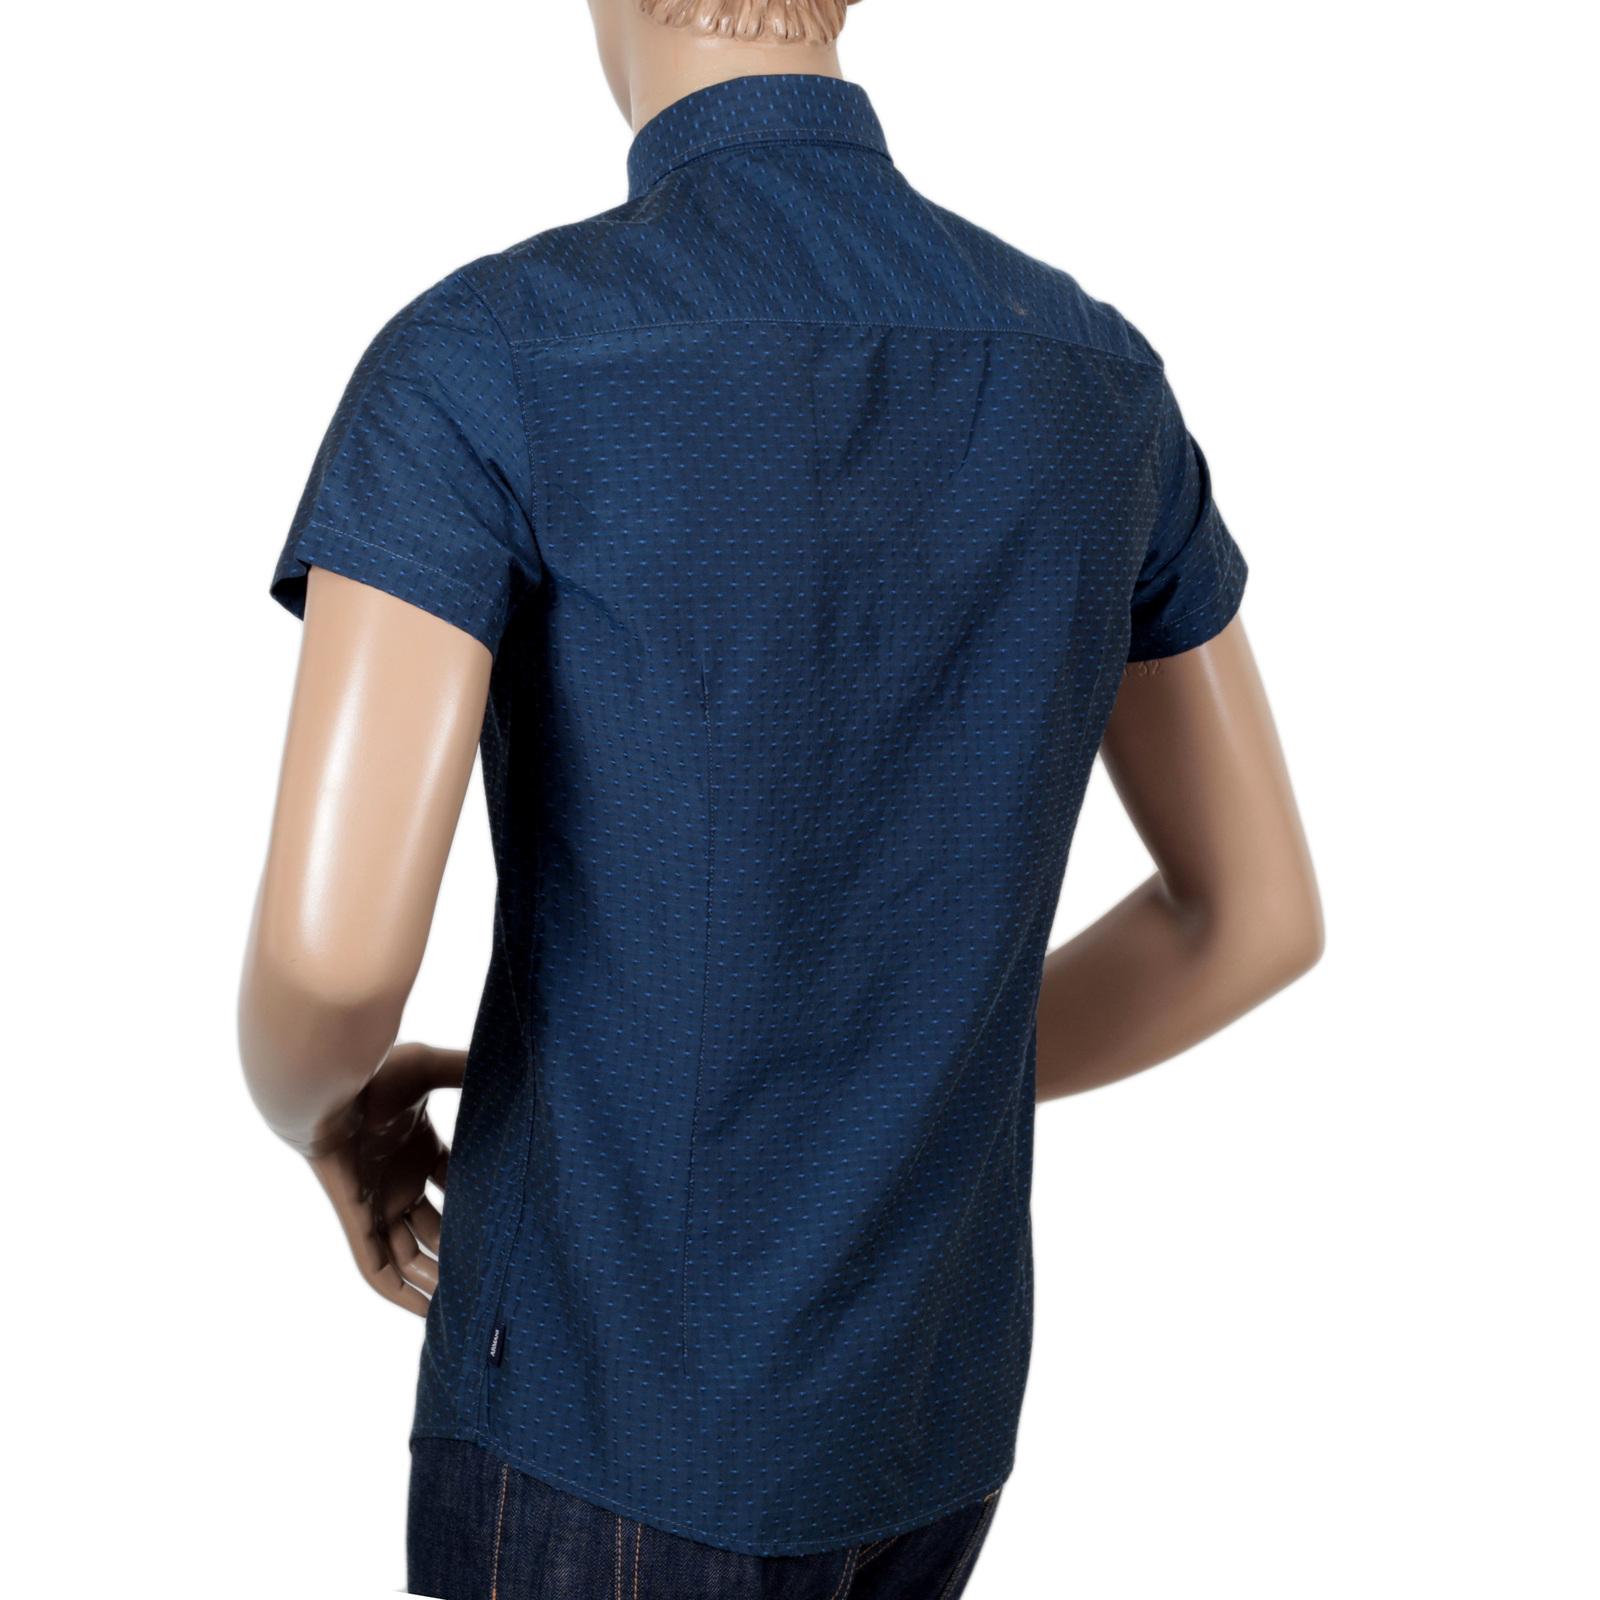 1e4b8139 Armani Jeans Mens Tipped Short Sleeve Polo Shirt